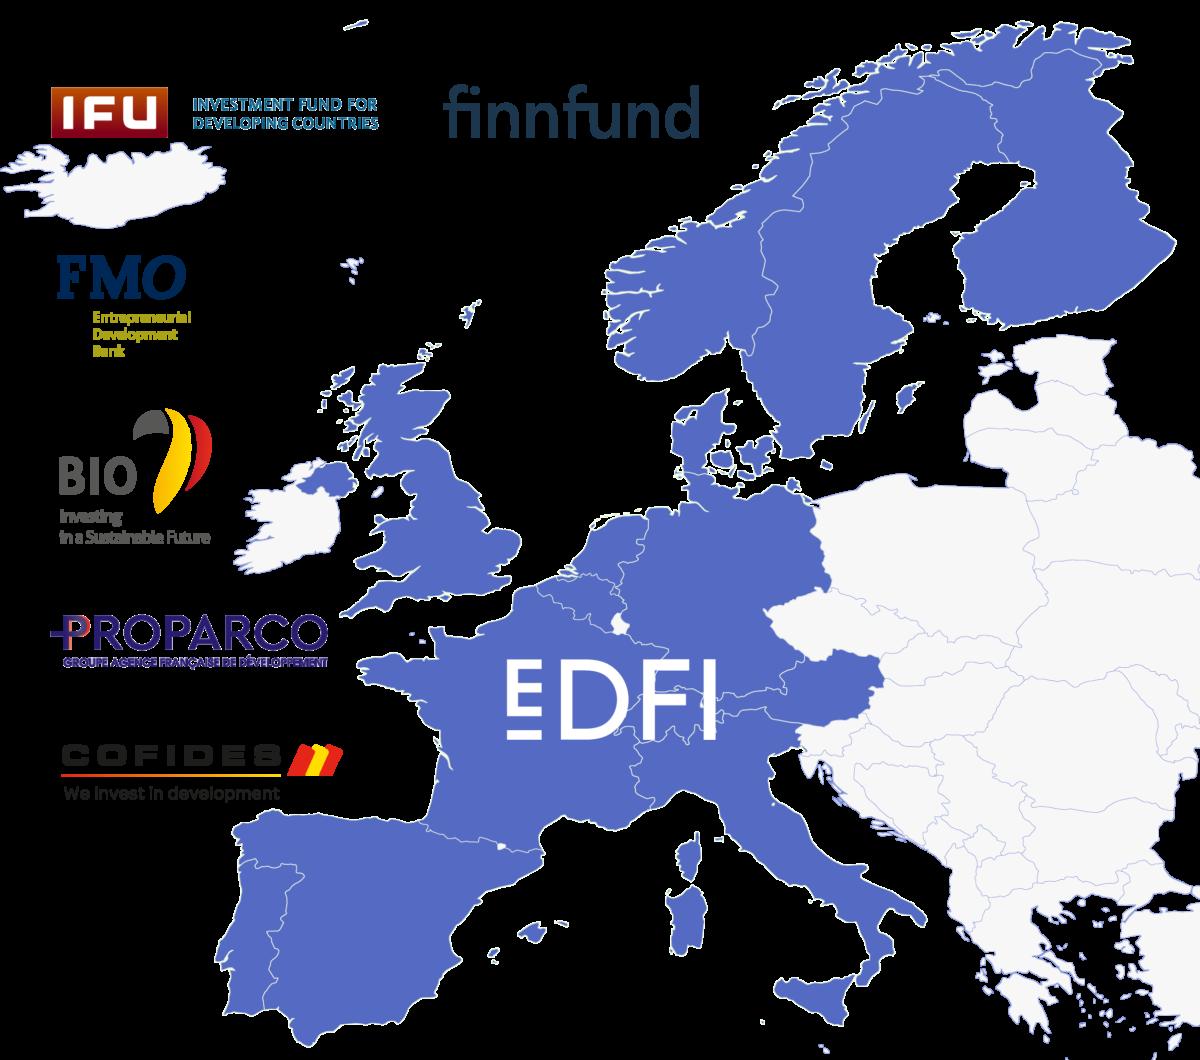 European ambitions